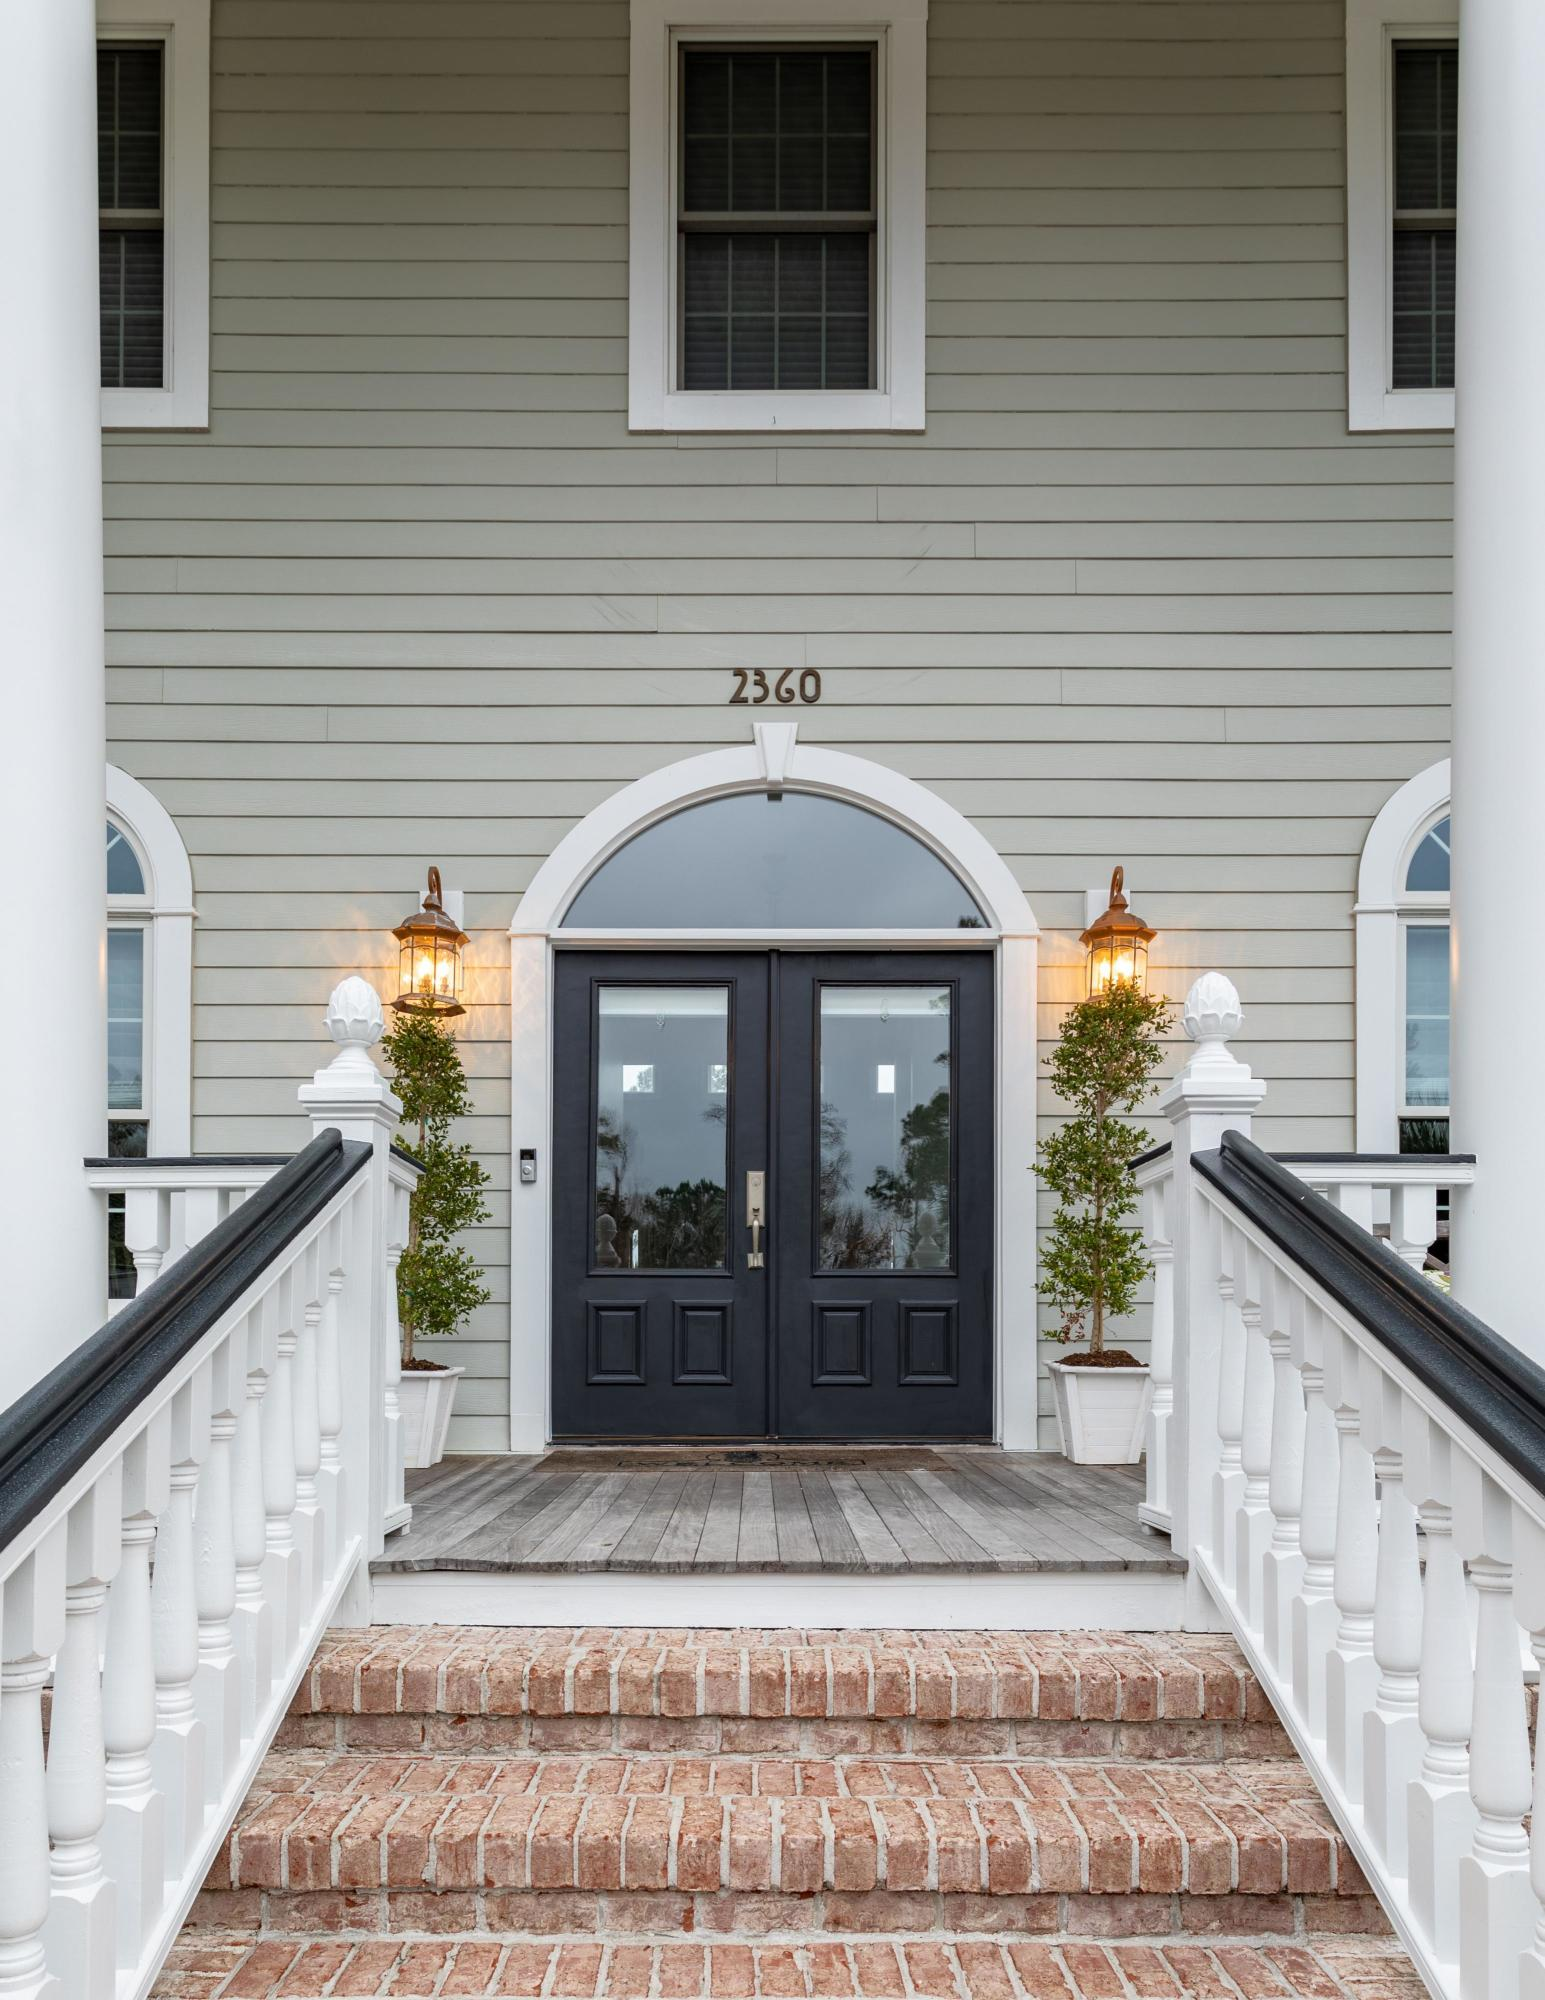 Dunes West Homes For Sale - 2360 Darts Cove, Mount Pleasant, SC - 0